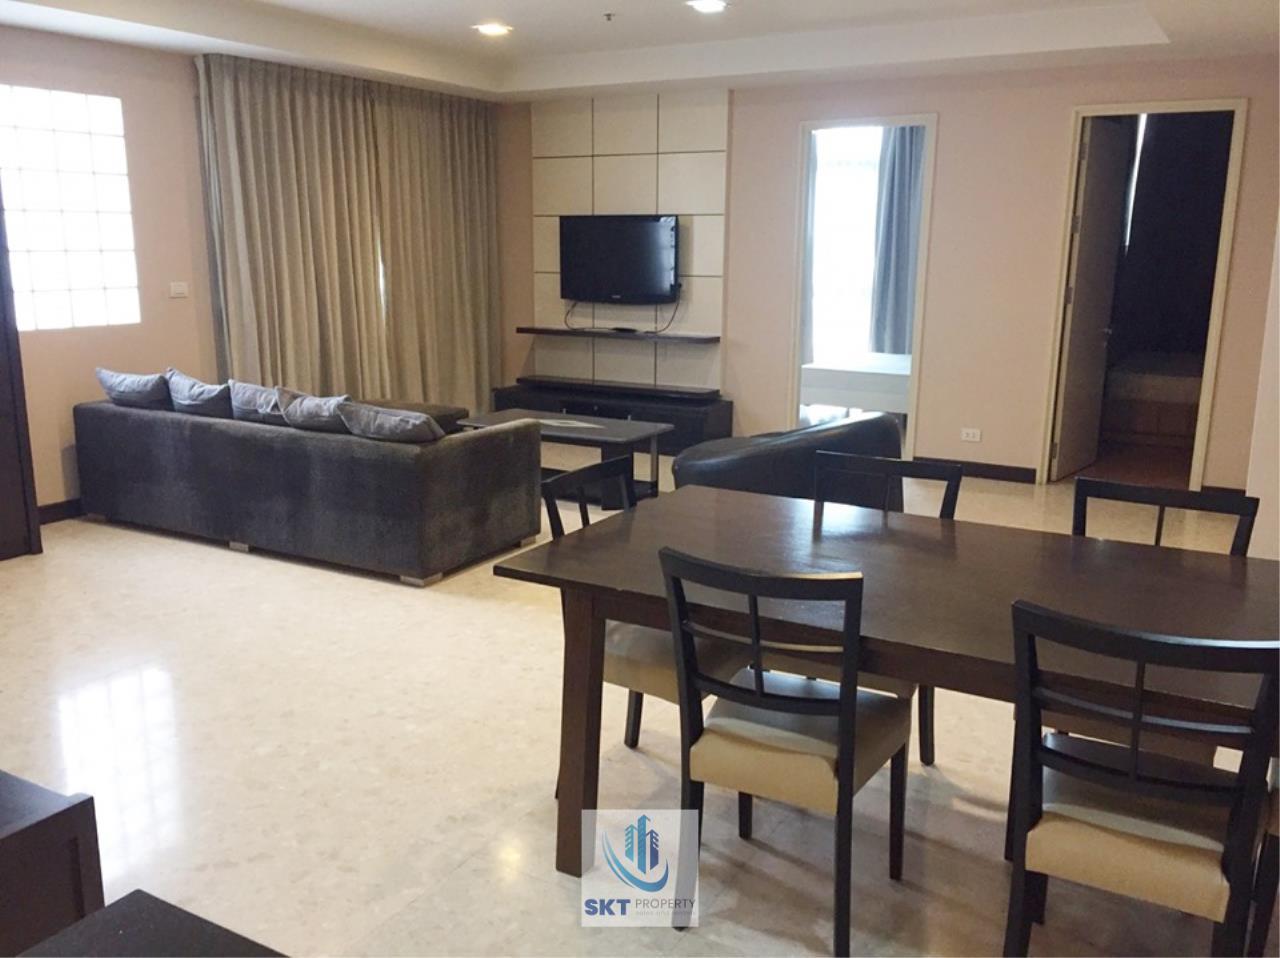 Sukritta Property Agency's Nusasiri grand condo neat BTS Ekamai 2